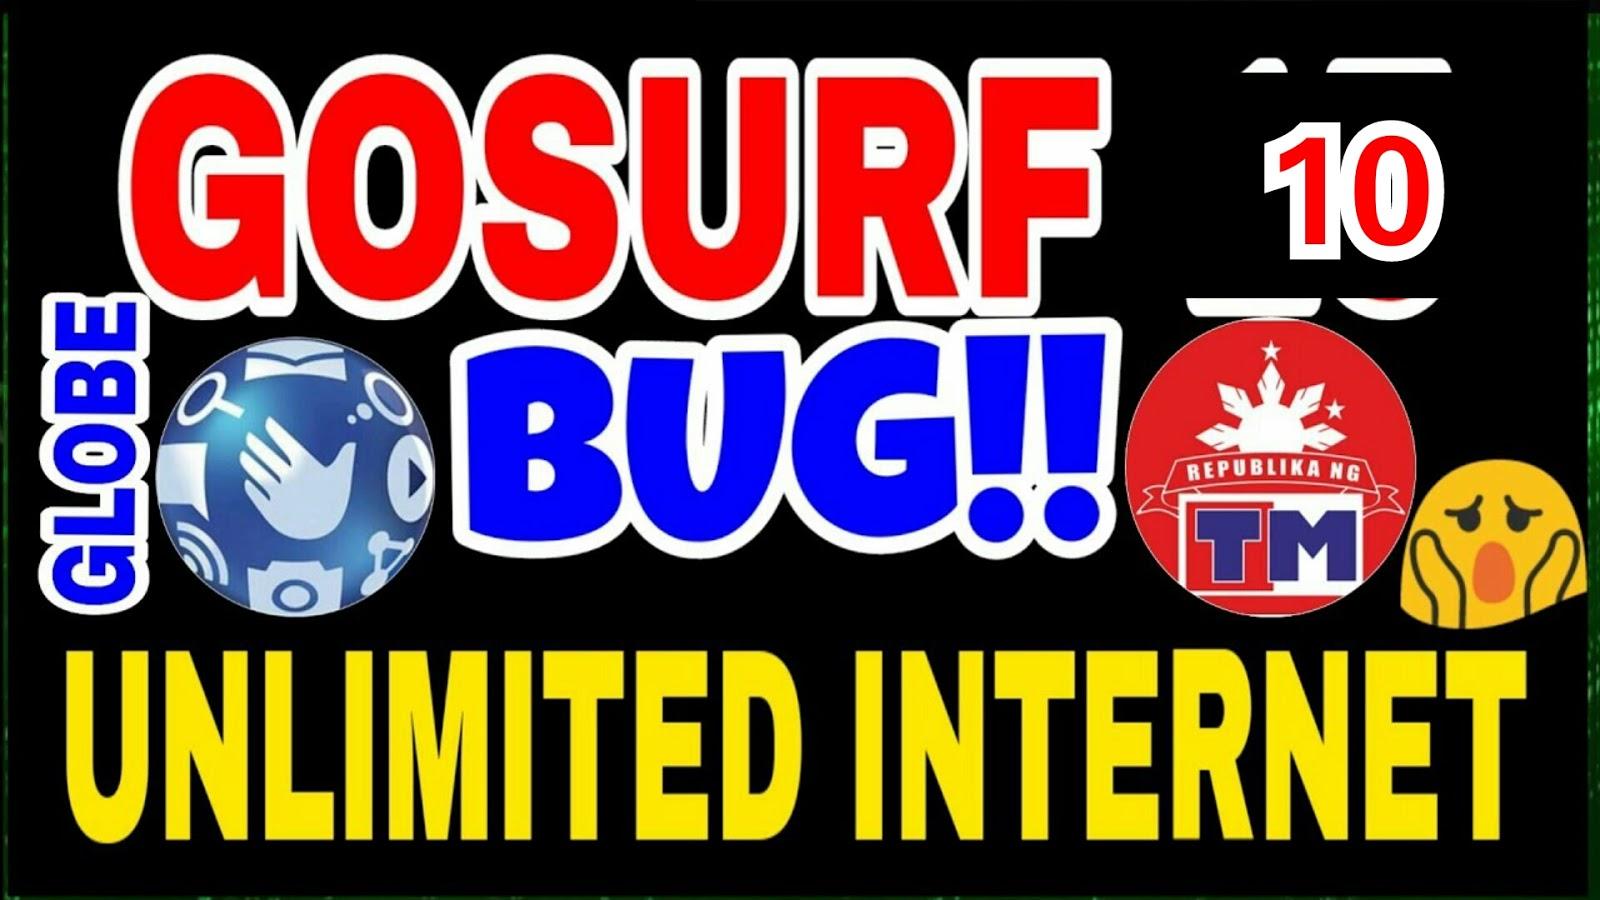 Globe & TM Gosurf Bug January 13, 2019 Update - Free Internet